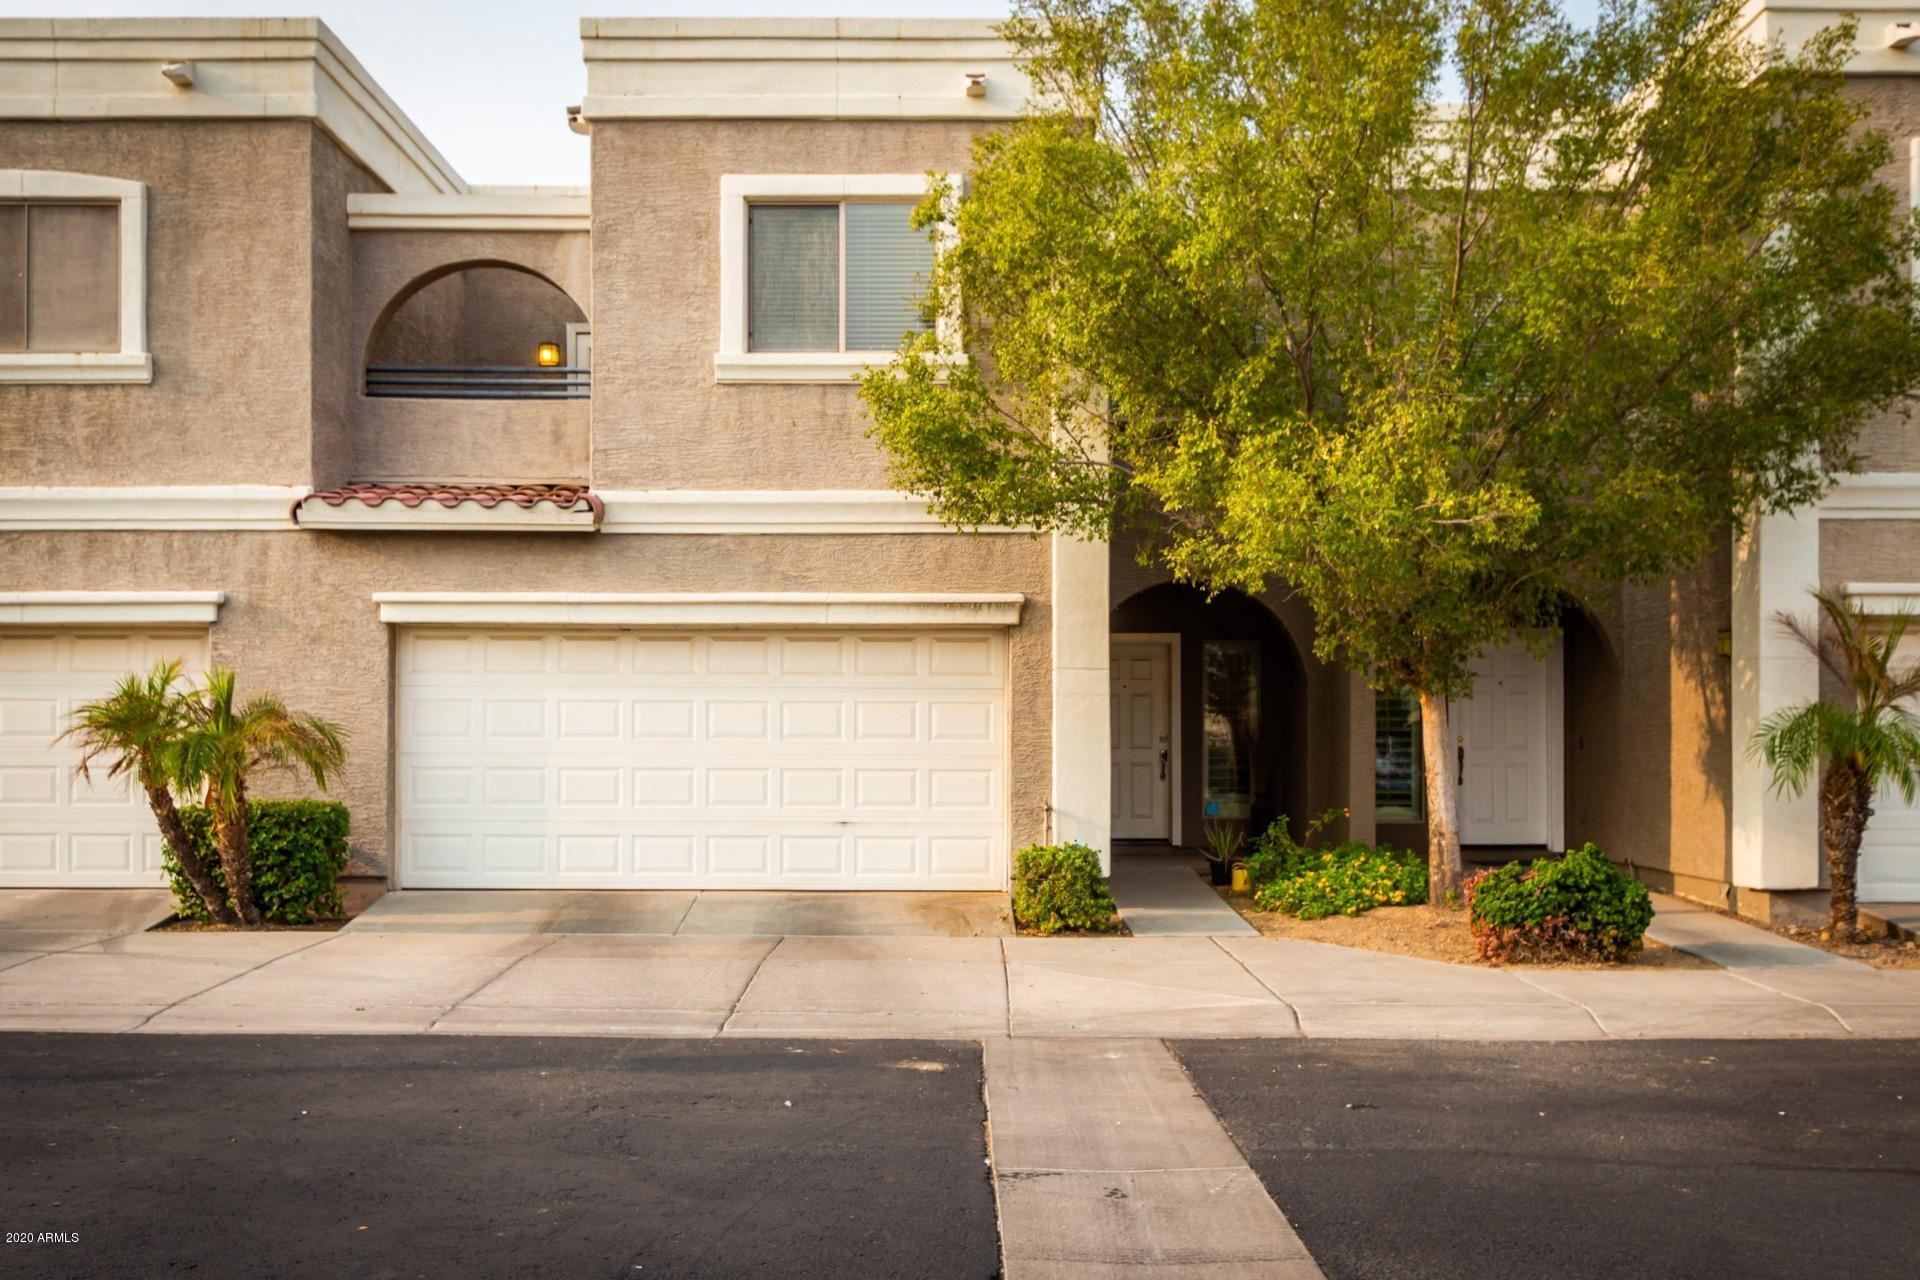 1640 W GEORGIA Avenue, Phoenix, AZ 85015 - MLS#: 6132916